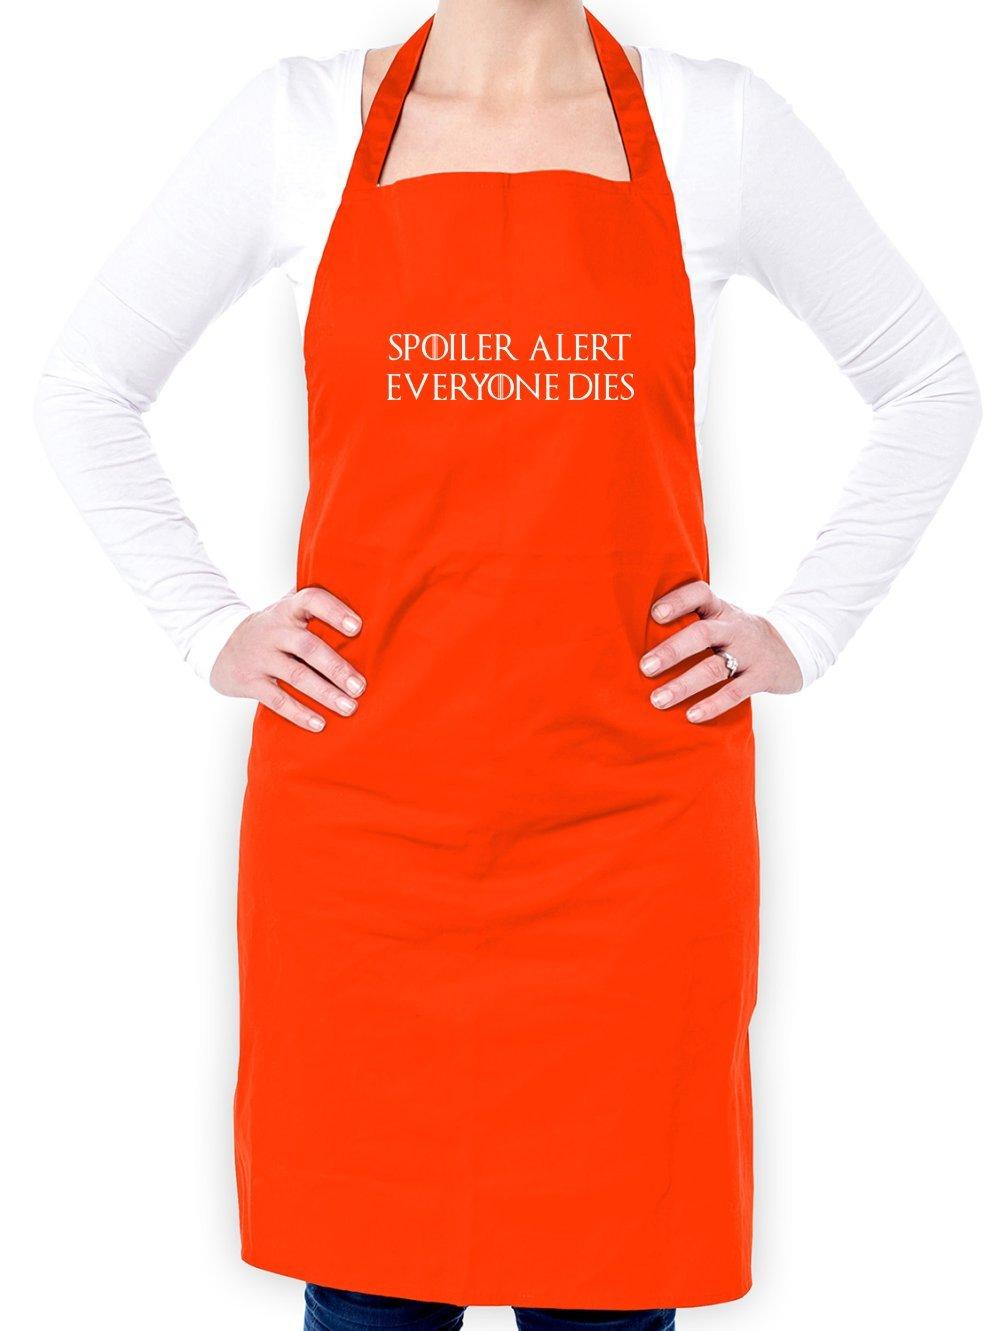 Spoiler Alert Everyone Dies - Unisex Adult Apron - Orange - One Size